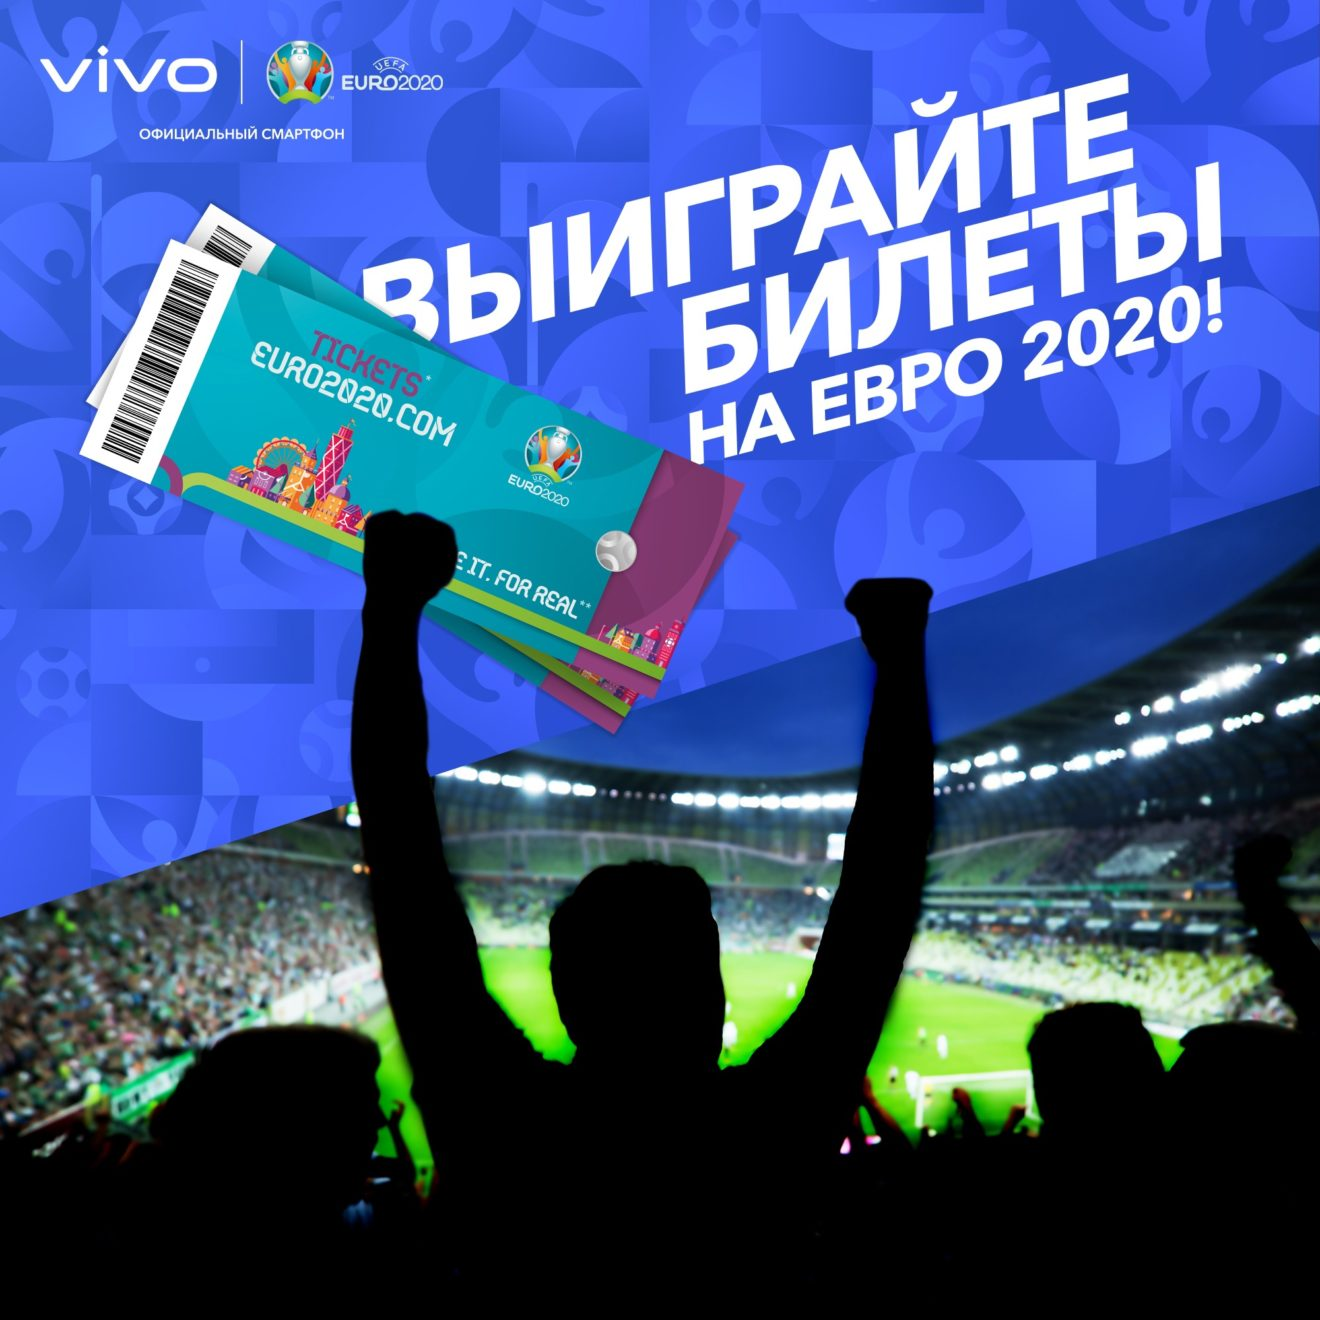 Разыгрываем три билета на Чемпионат УЕФА ЕВРО 2020